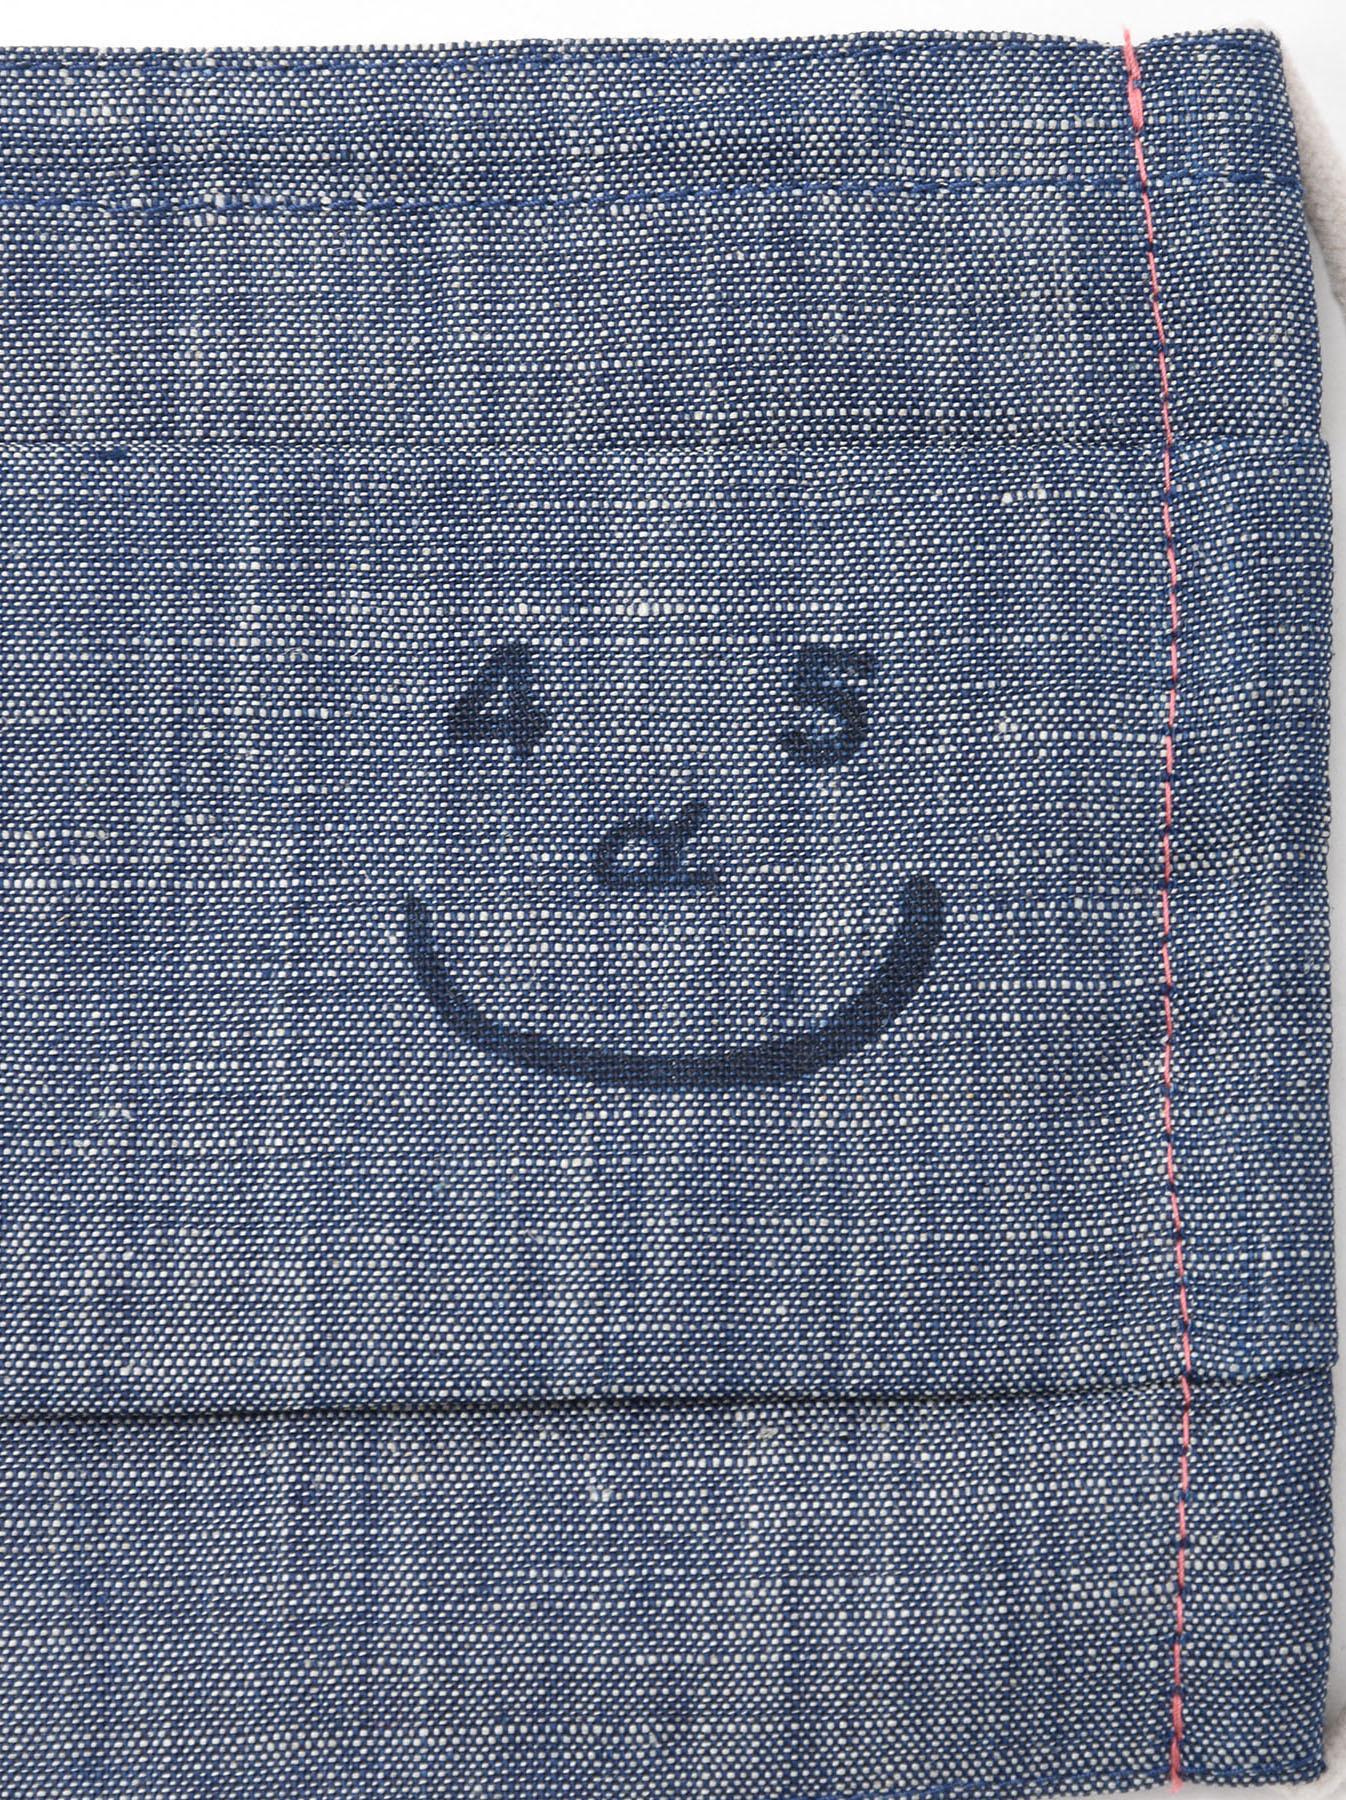 Smiling Khadi Masks-5